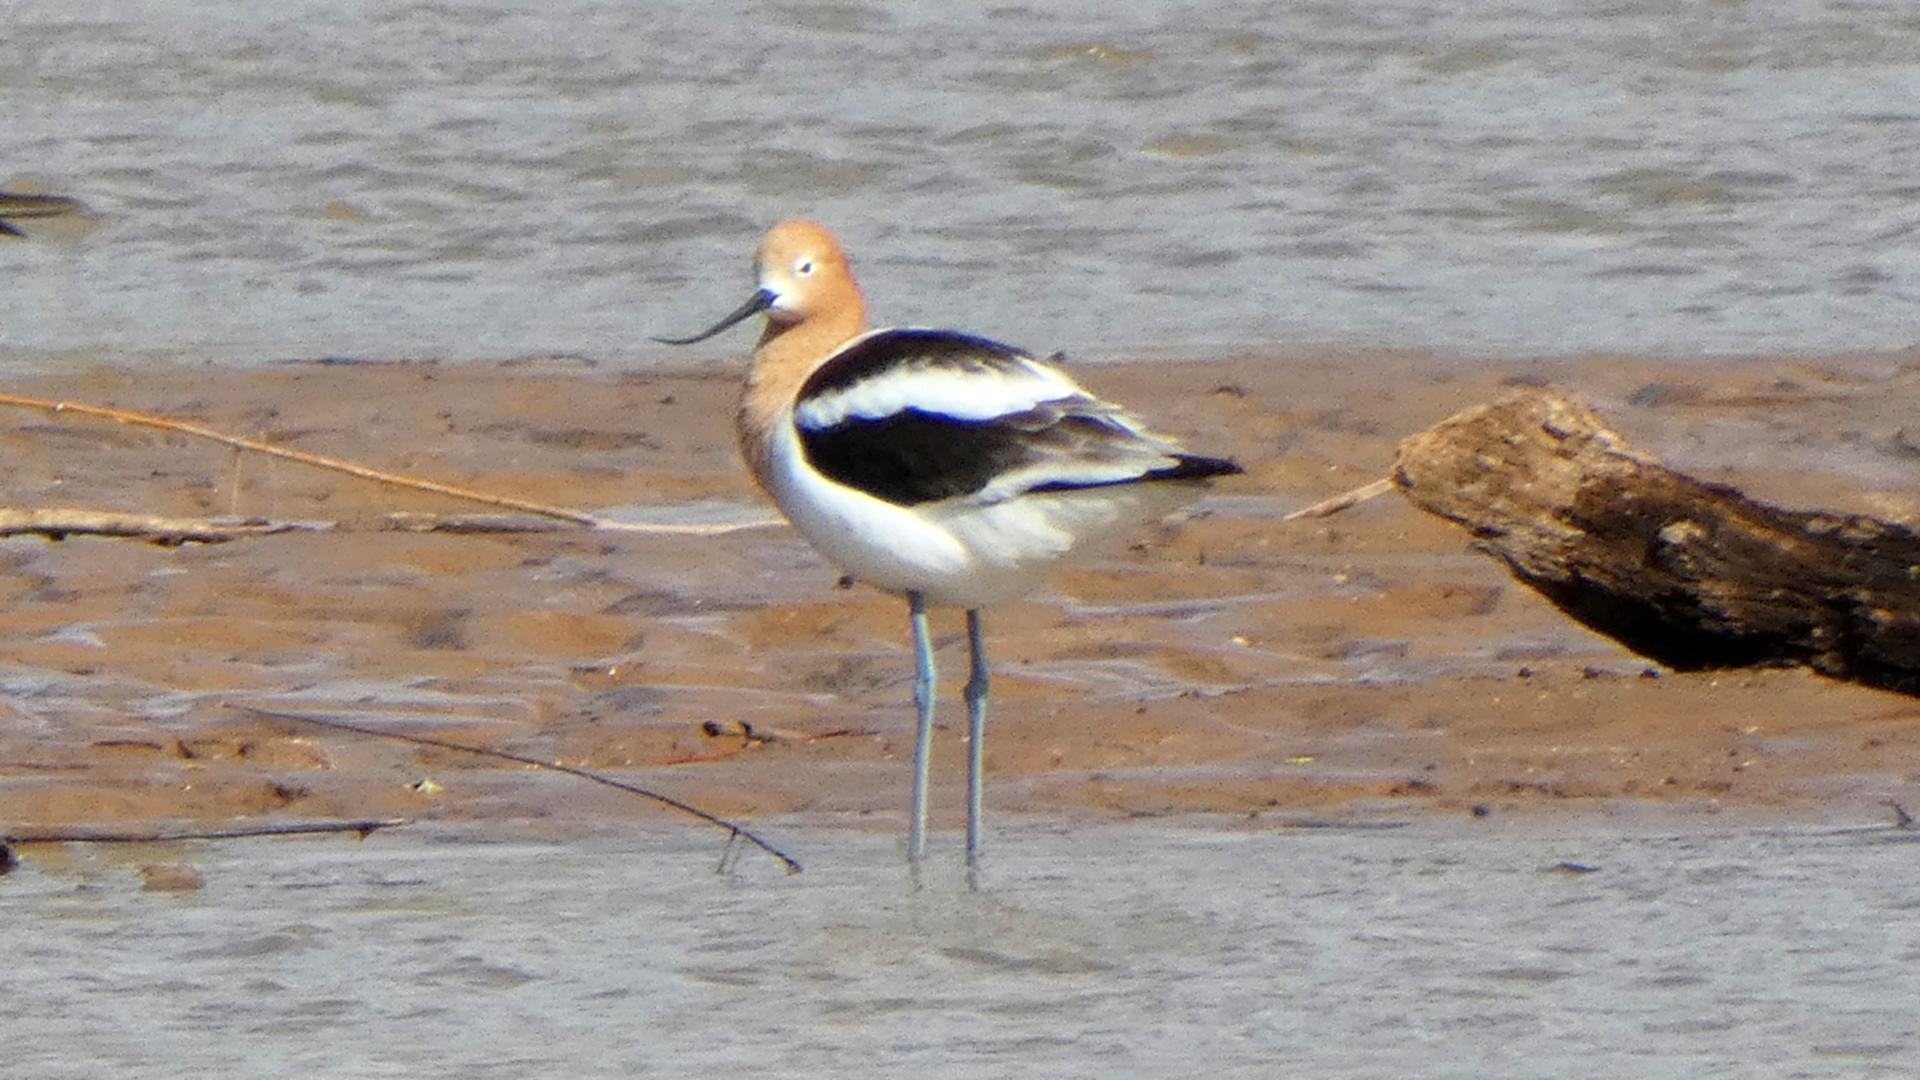 Breeding adult, Rio Grande, Albuquerque, April 2021